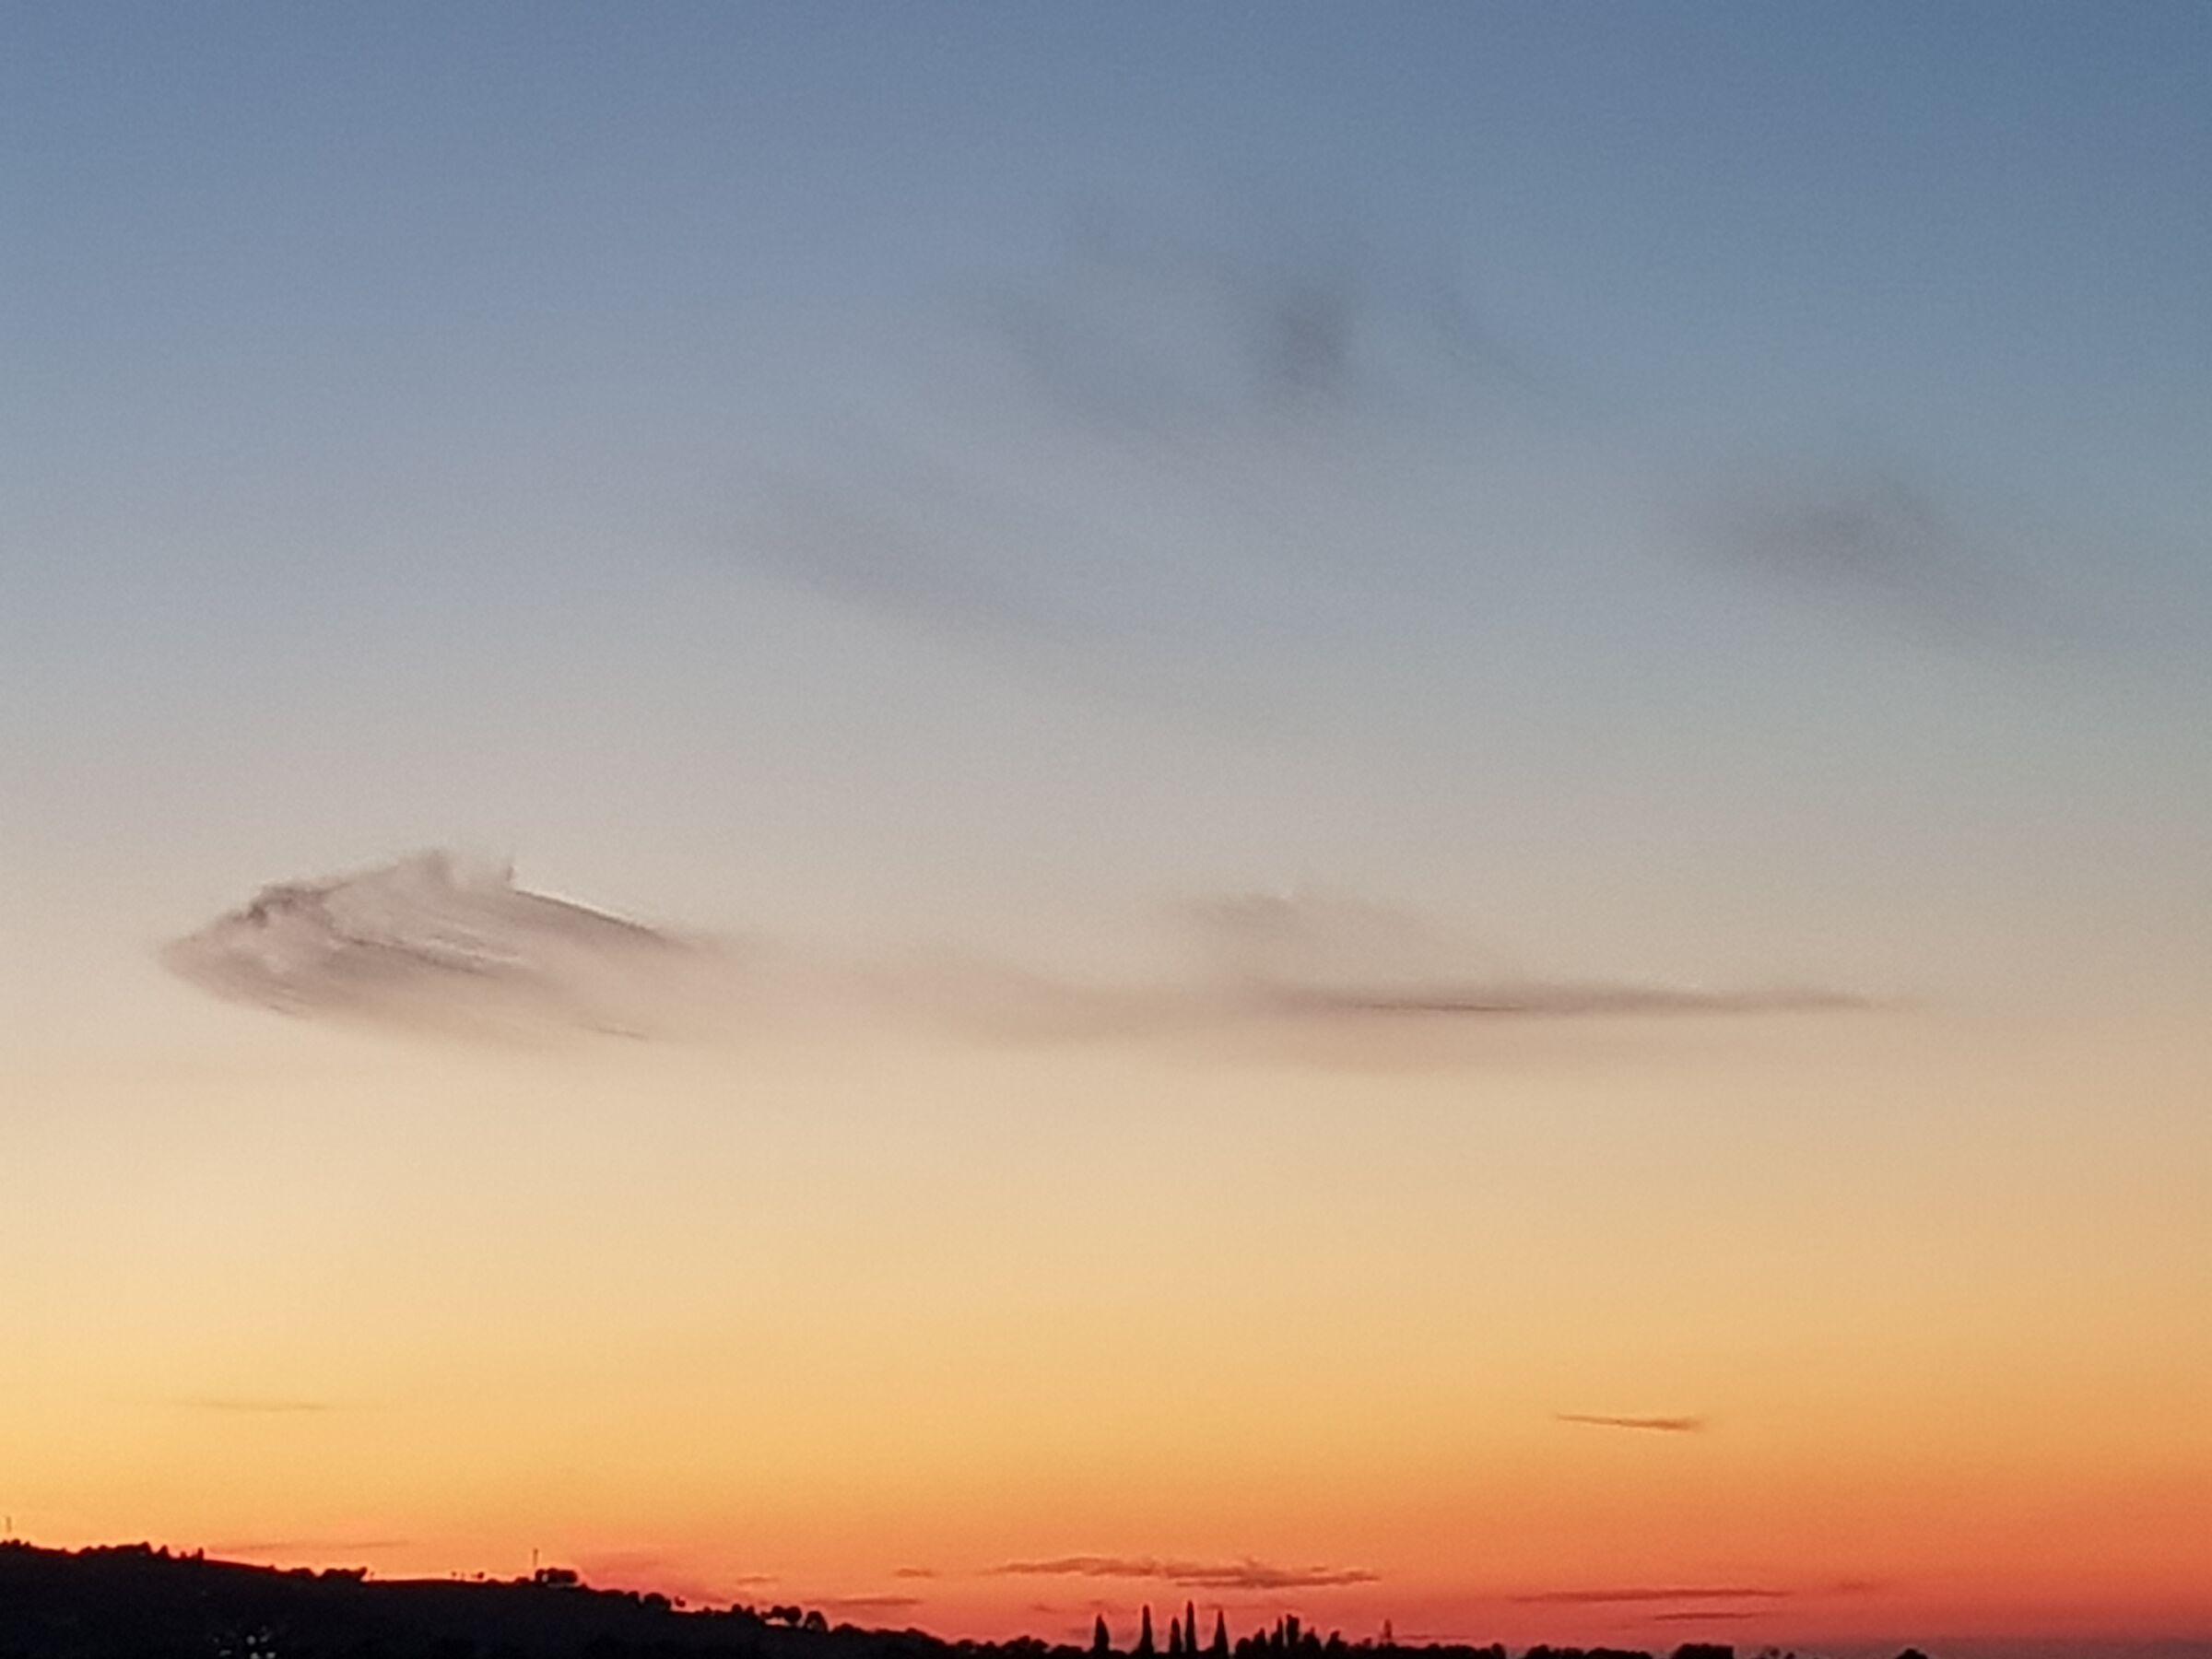 Nuvole strane al tramonto...